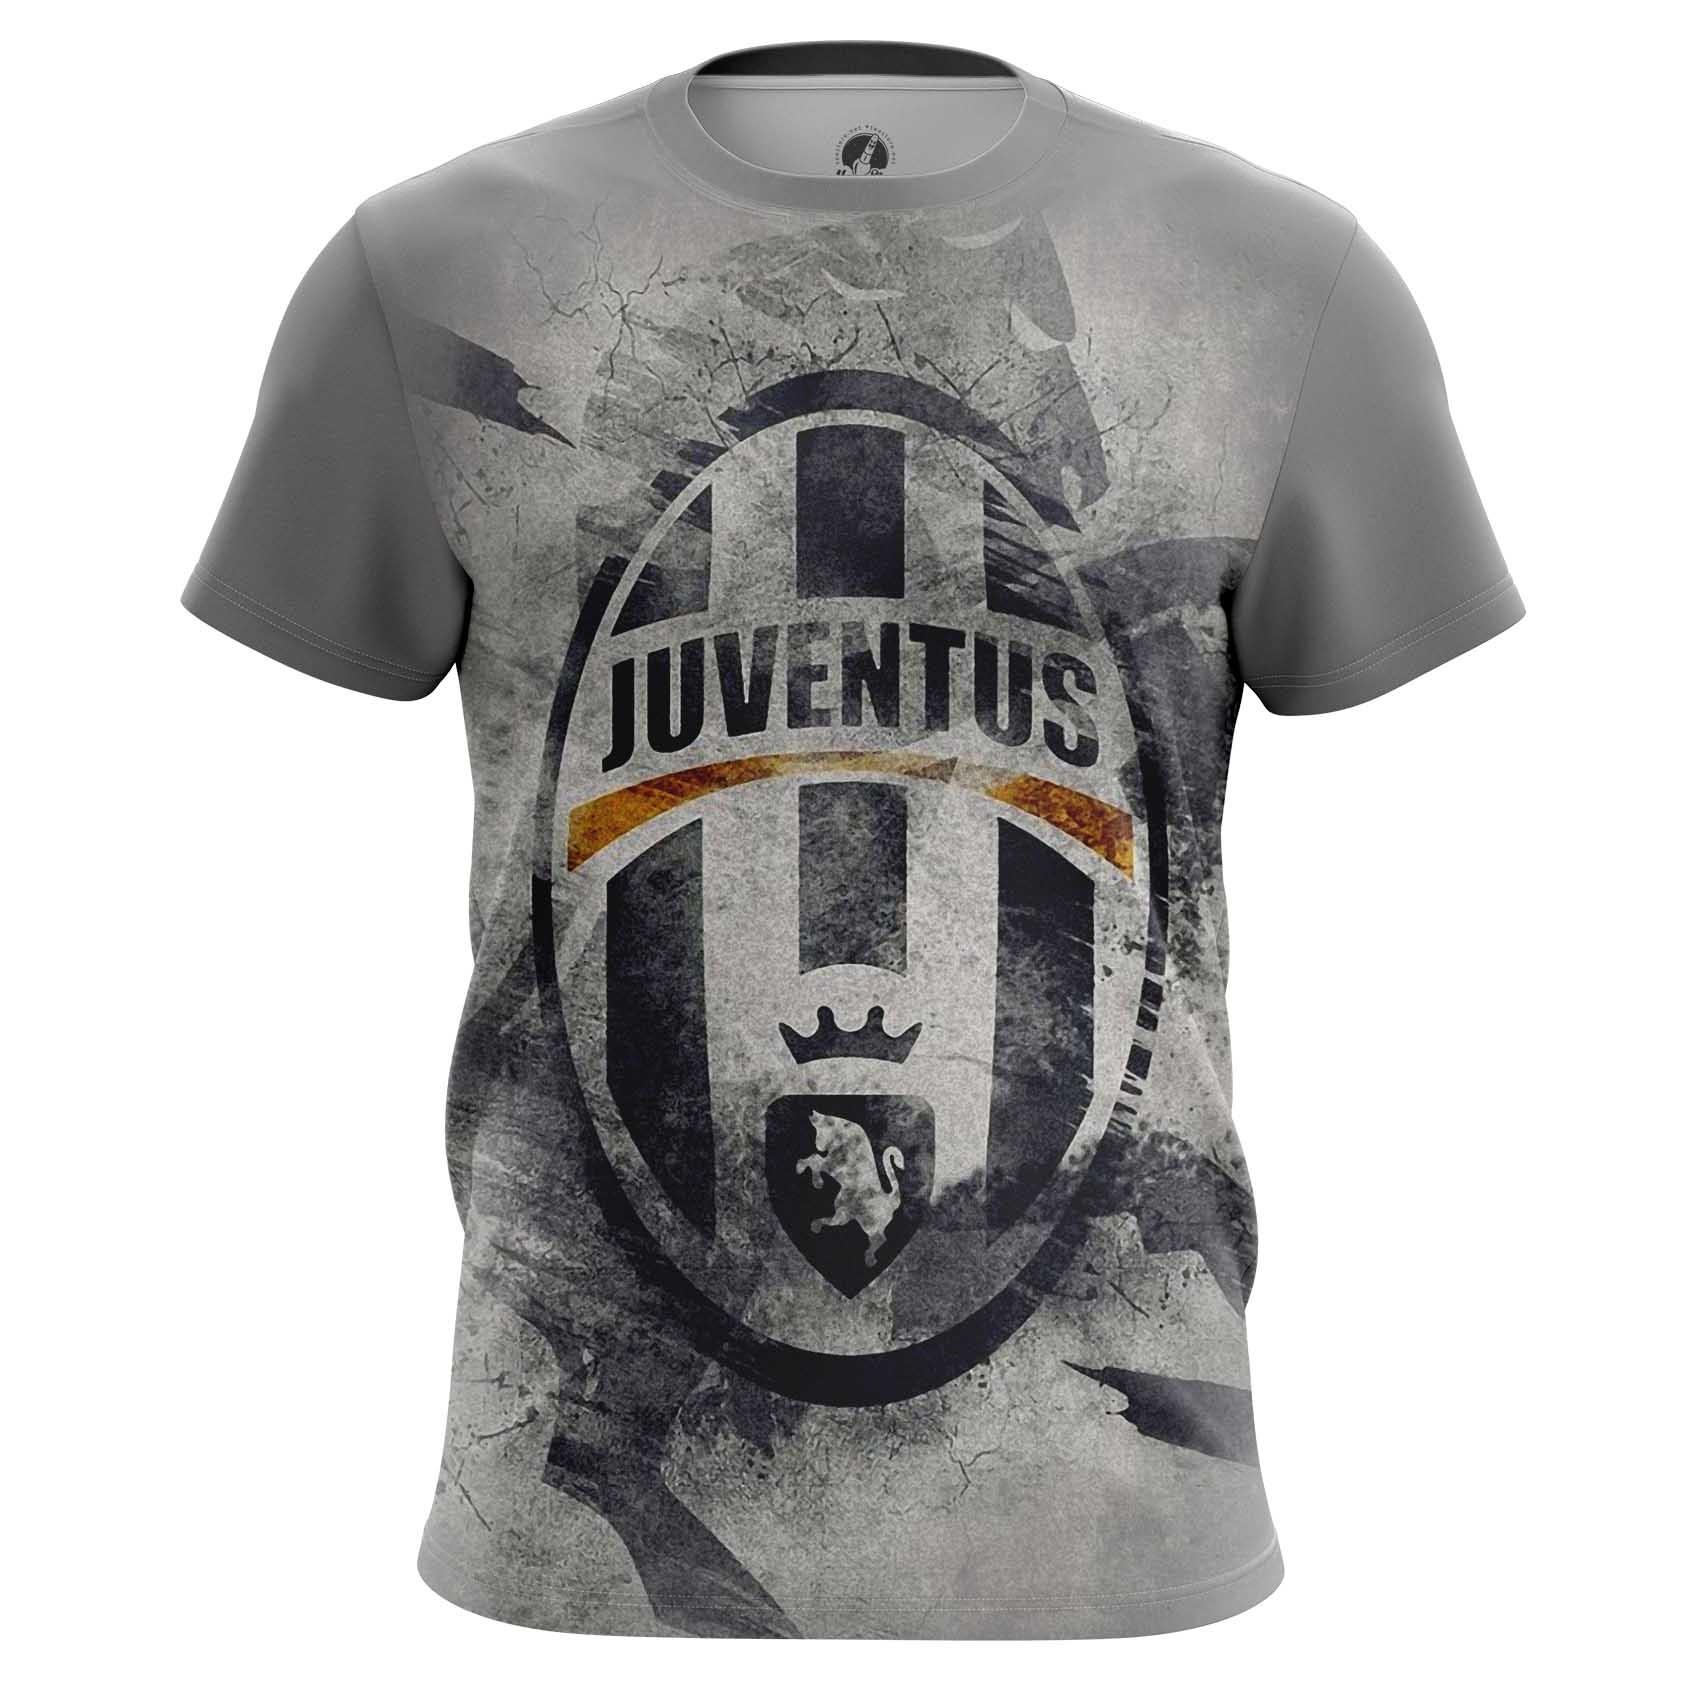 Collectibles Long Sleeve Juventus Juv Fan Football